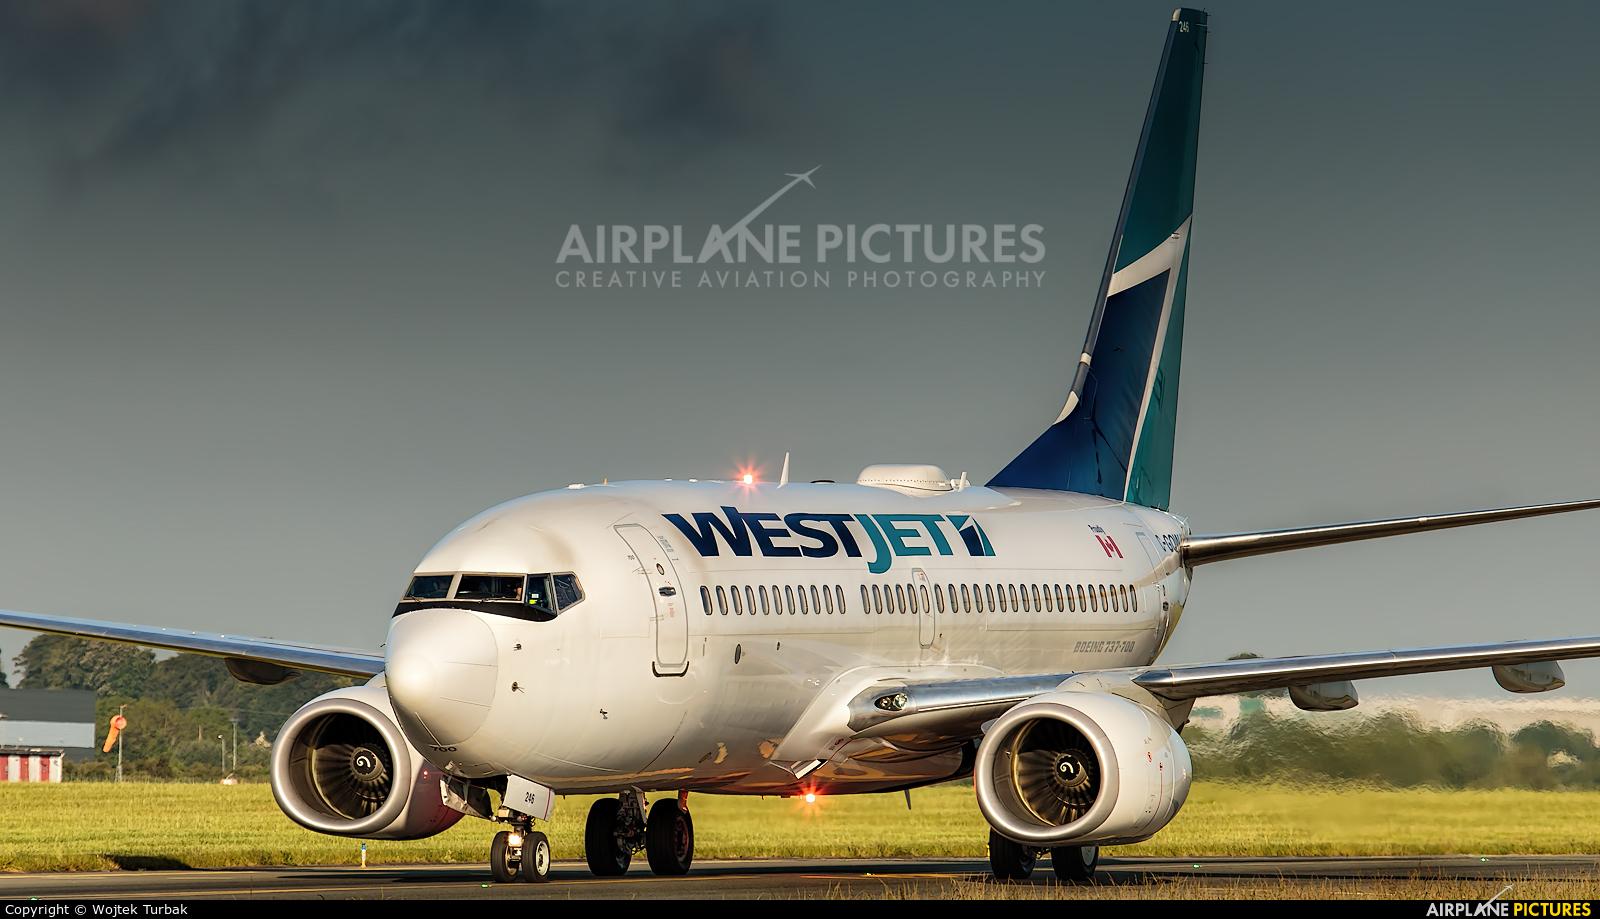 WestJet Airlines C-GQWJ aircraft at Dublin